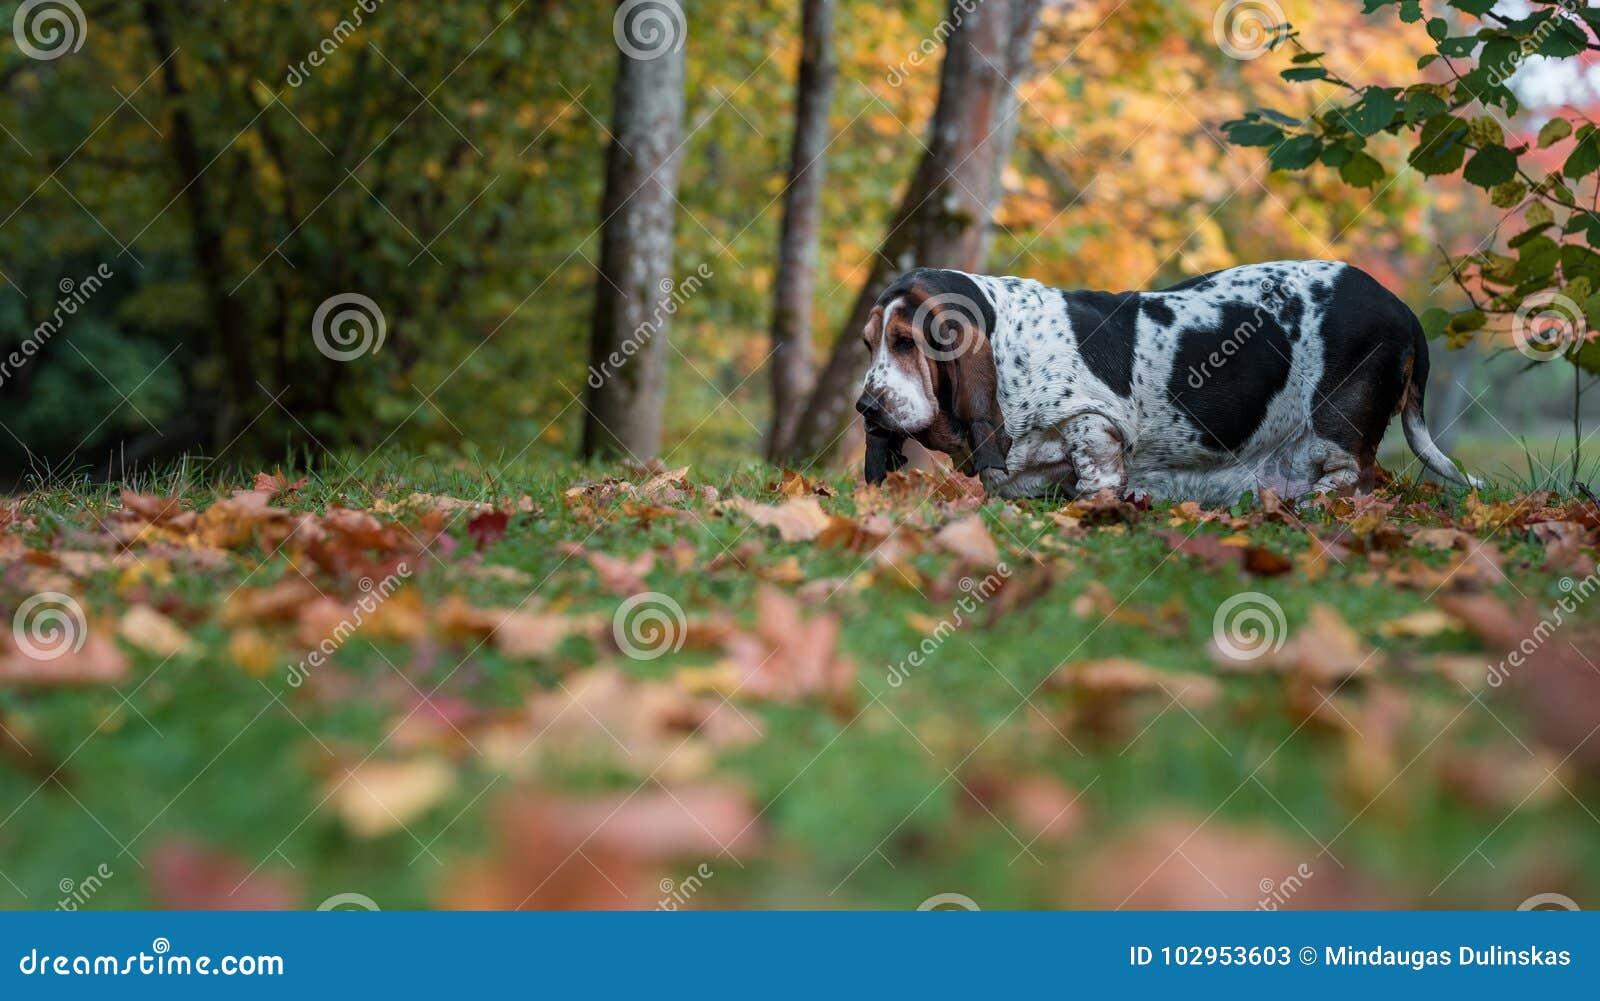 Basset Hound Dog Walks on the Autumn Leaves. Portrait.